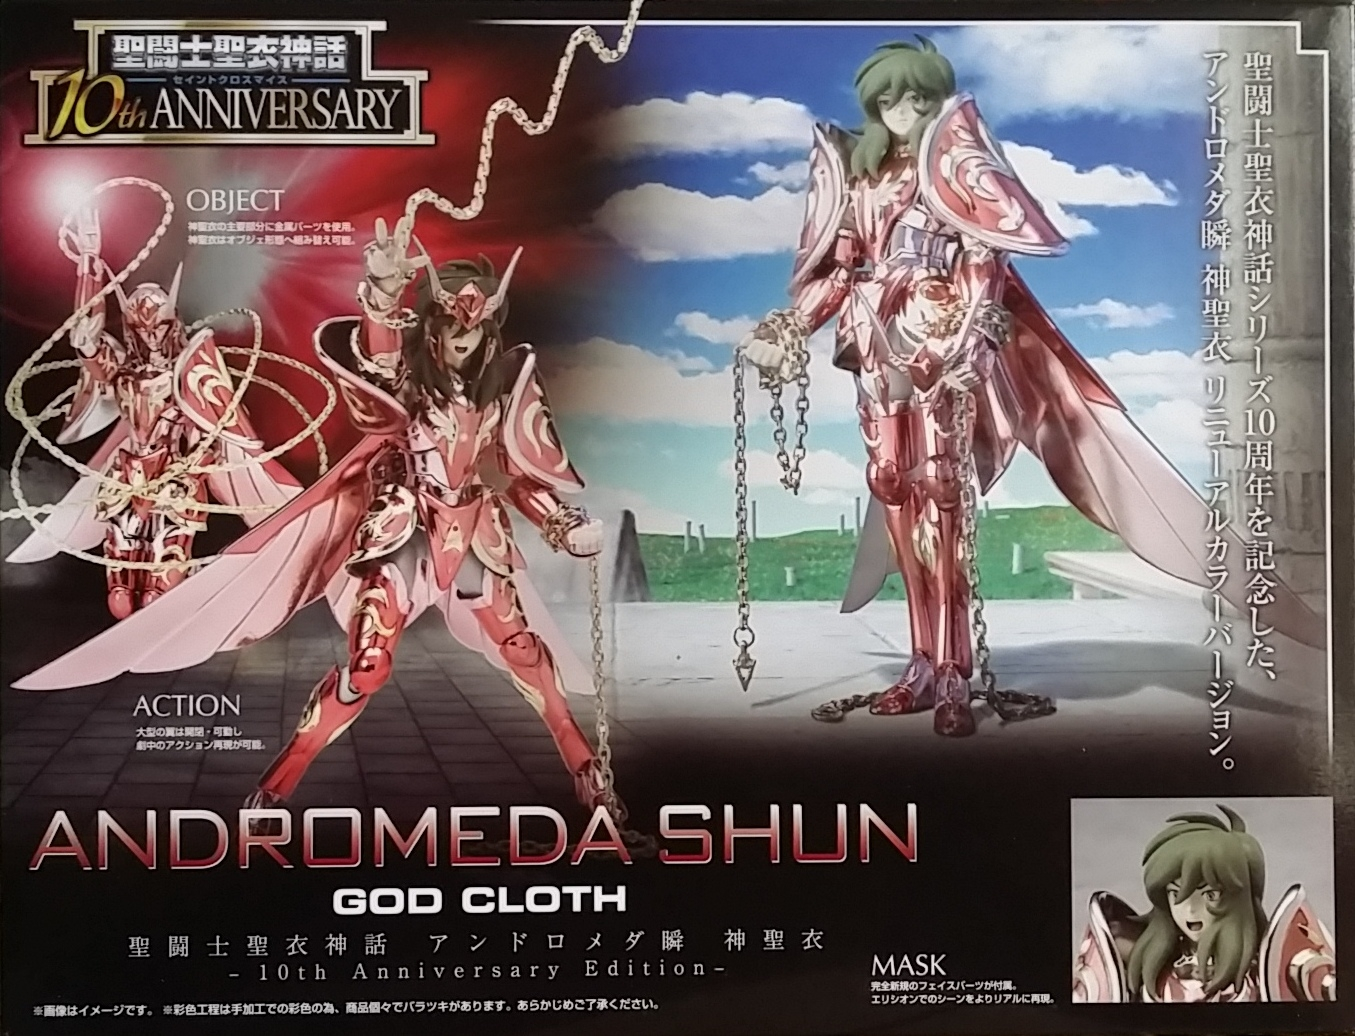 Andromeda Shun V4 God Cloth - 10th Anniversary -